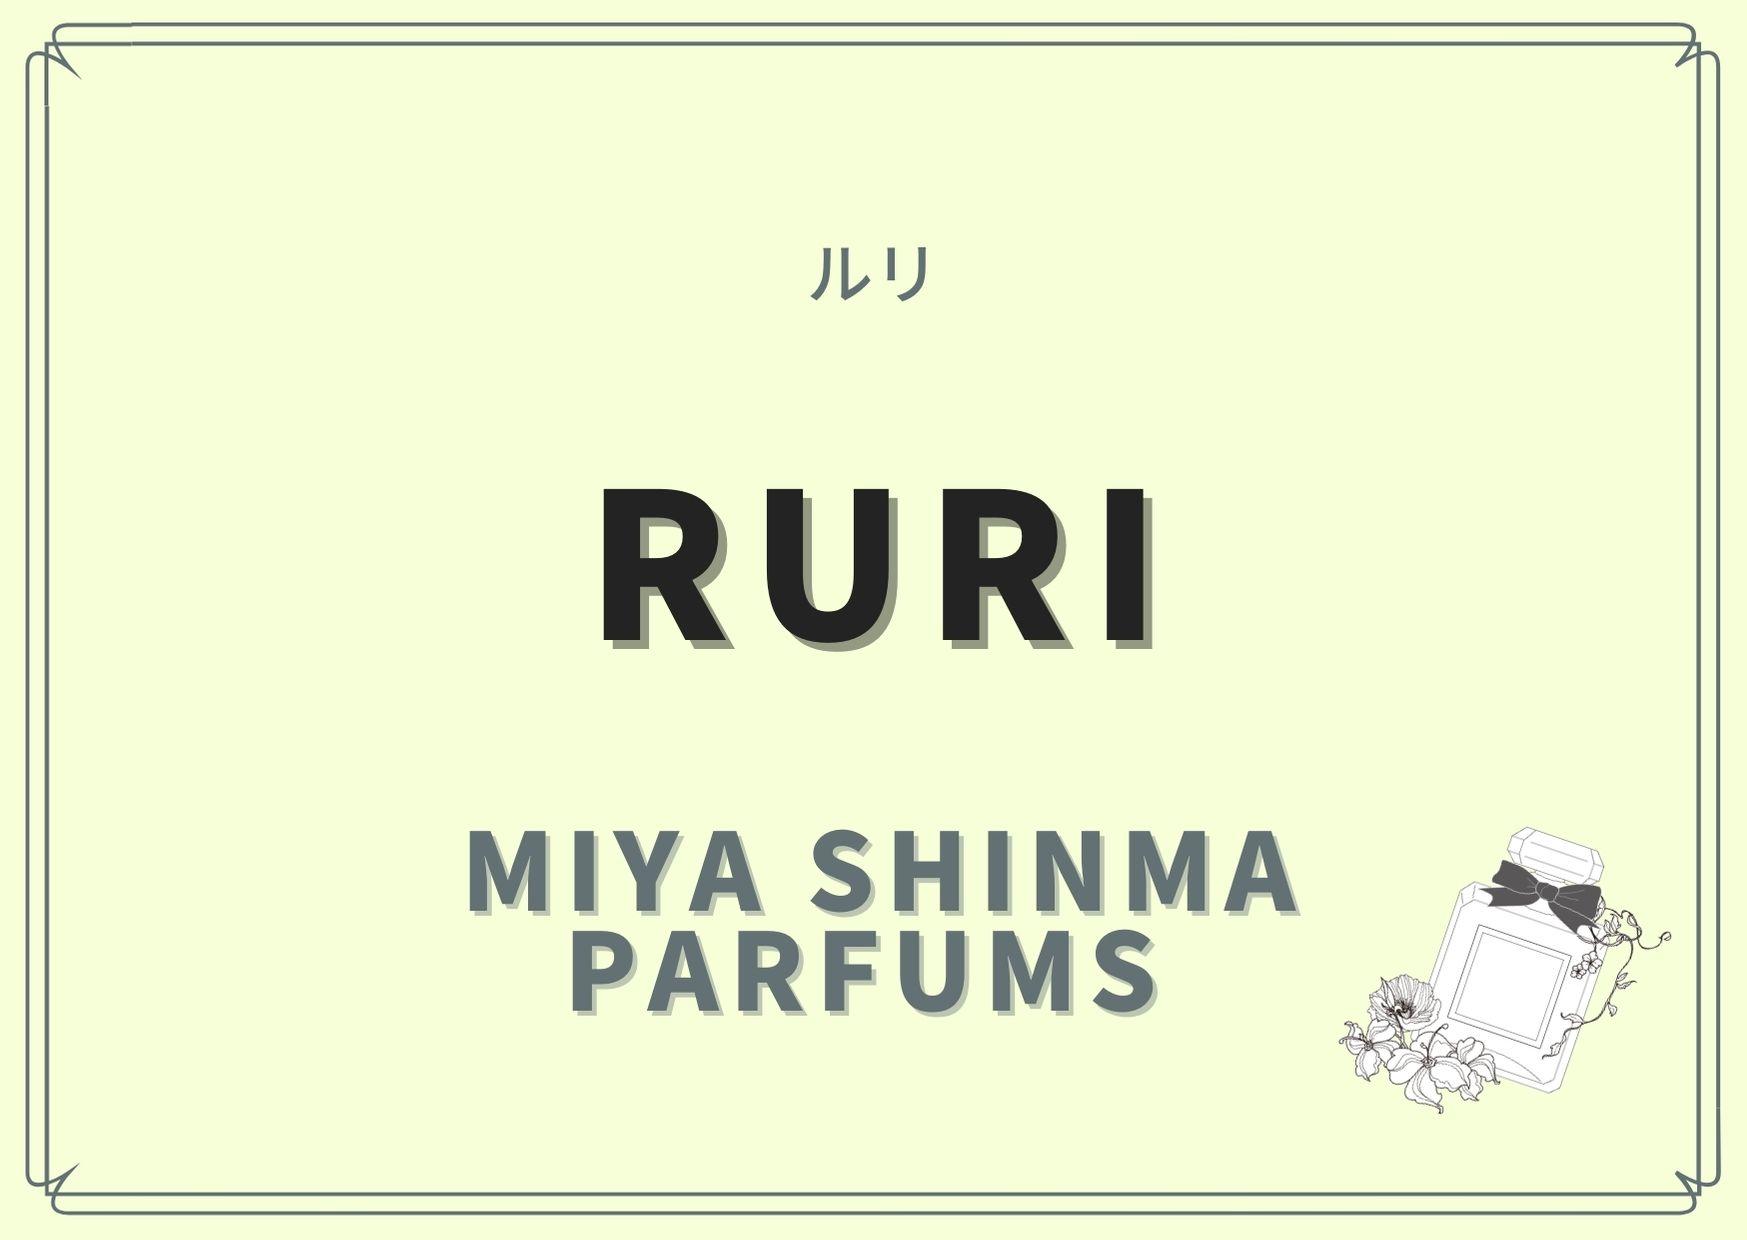 RURI(ルリ)/Miya Shinma parfums (ミヤ シンマ パルファン)